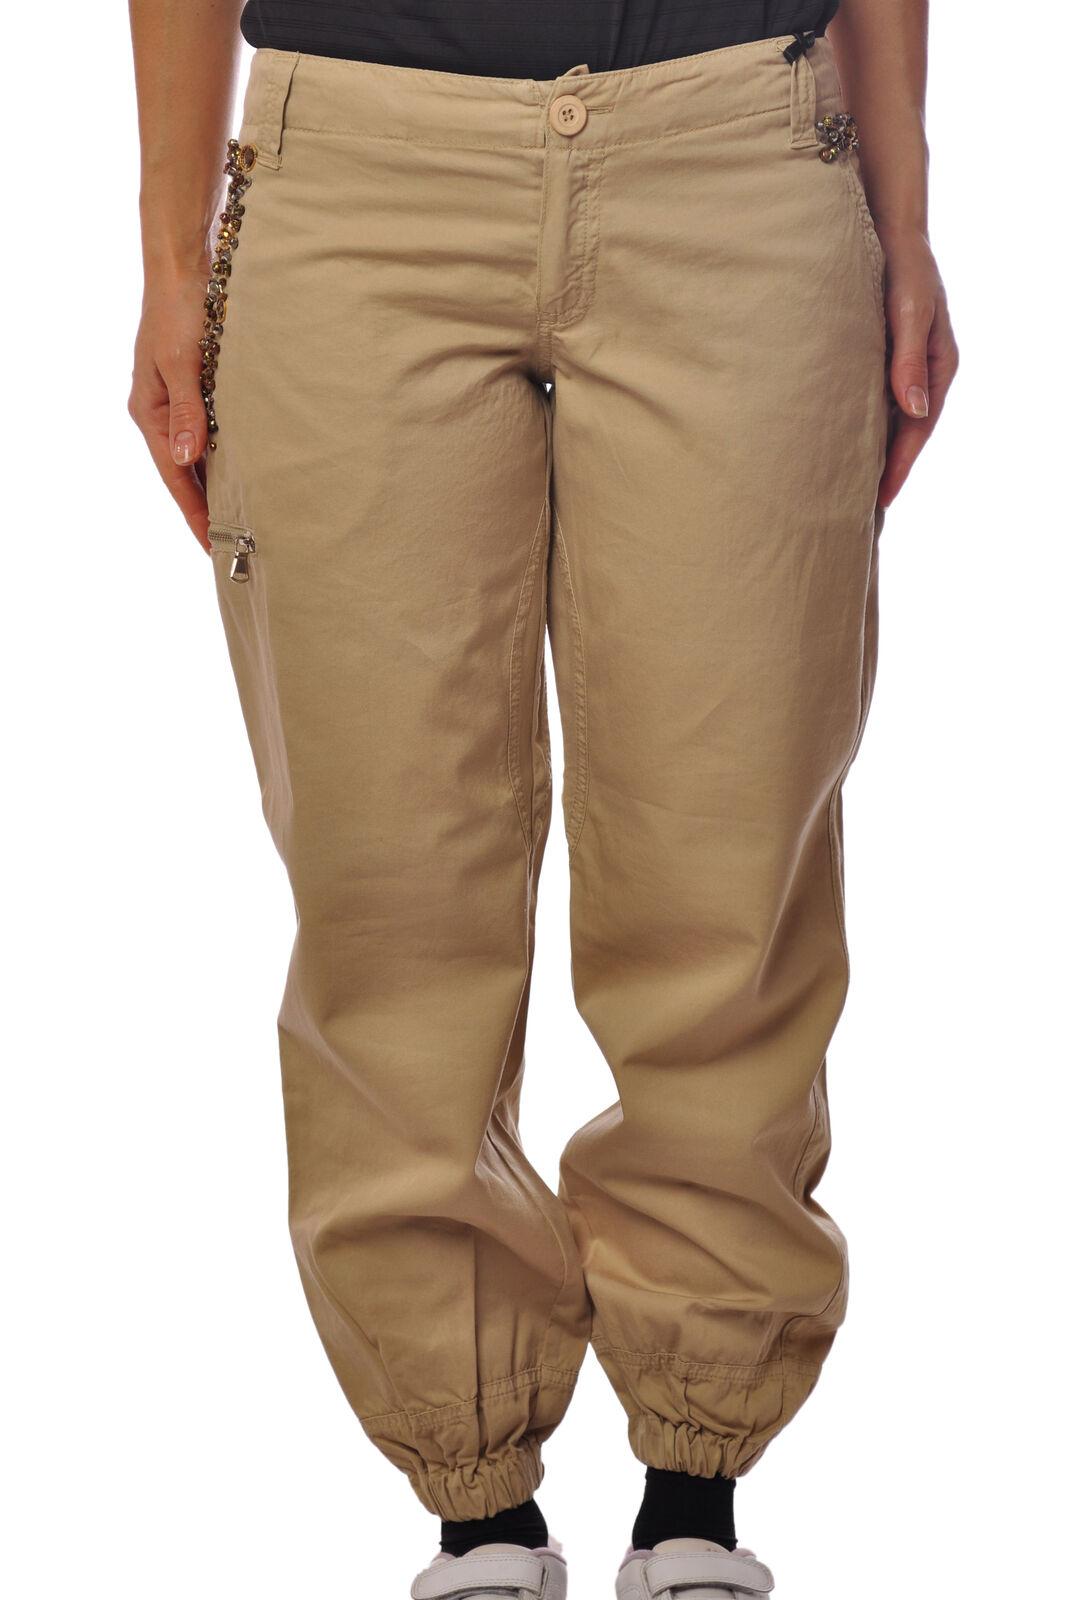 Hanita  -  Pants - Female - Beige - 2114213A183835